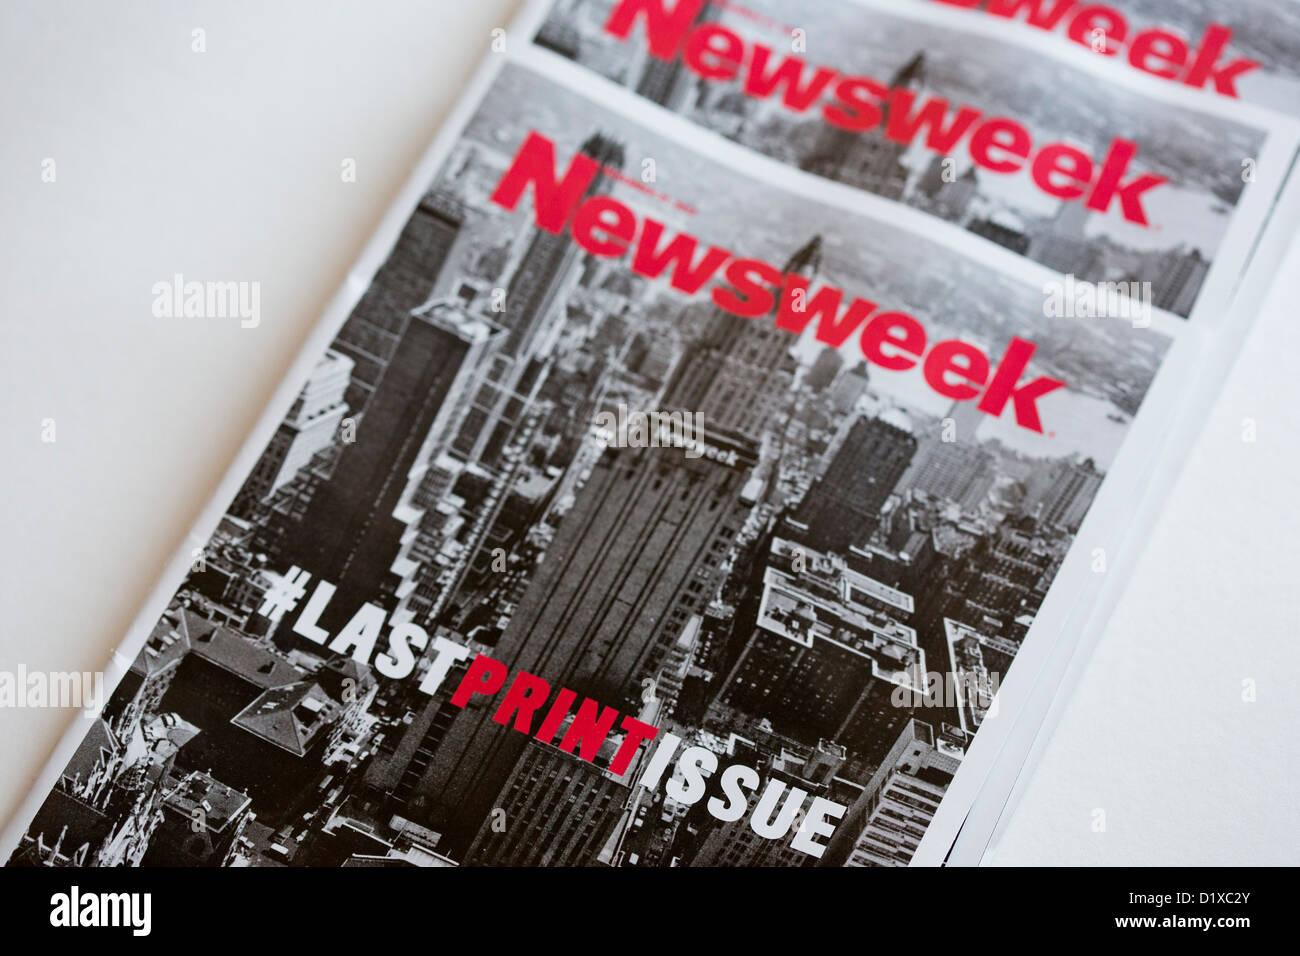 The final print edition of Newsweek magazine.  - Stock Image